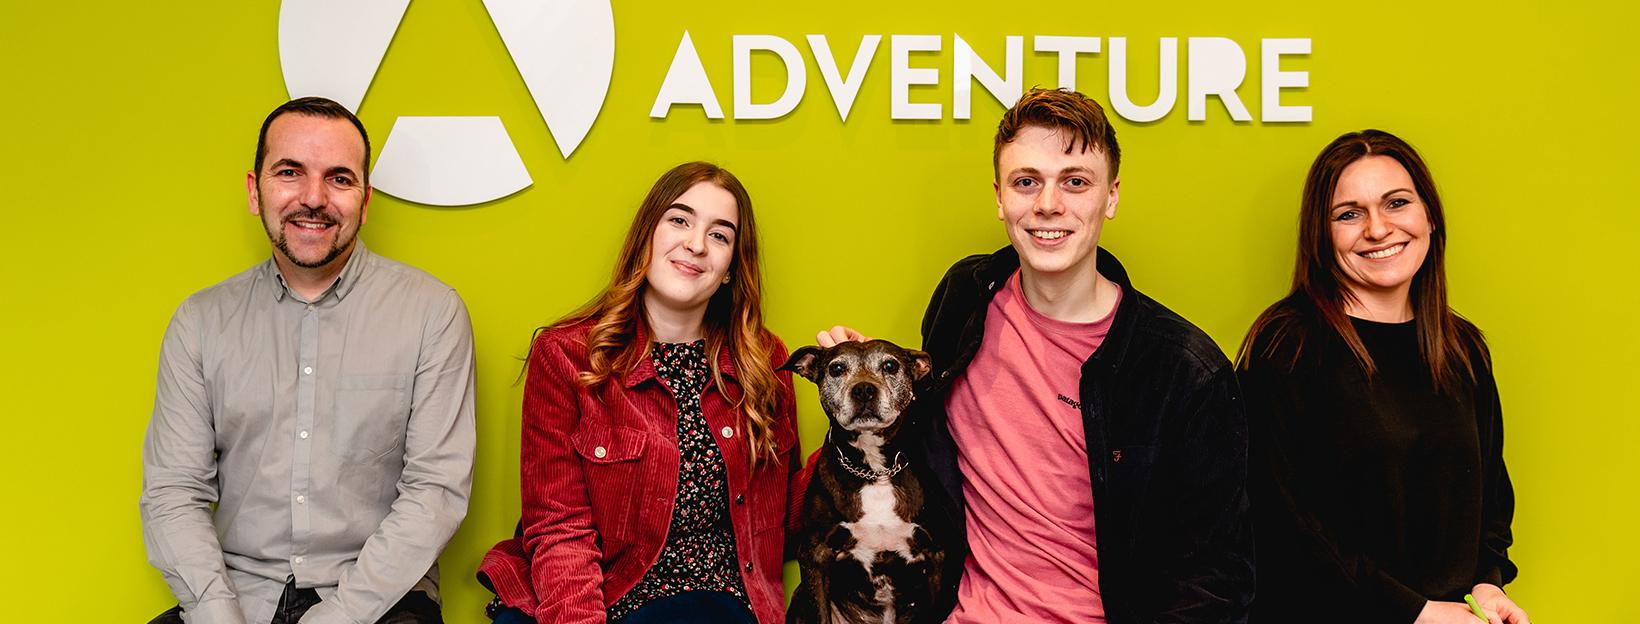 The Adventure Graphics Team